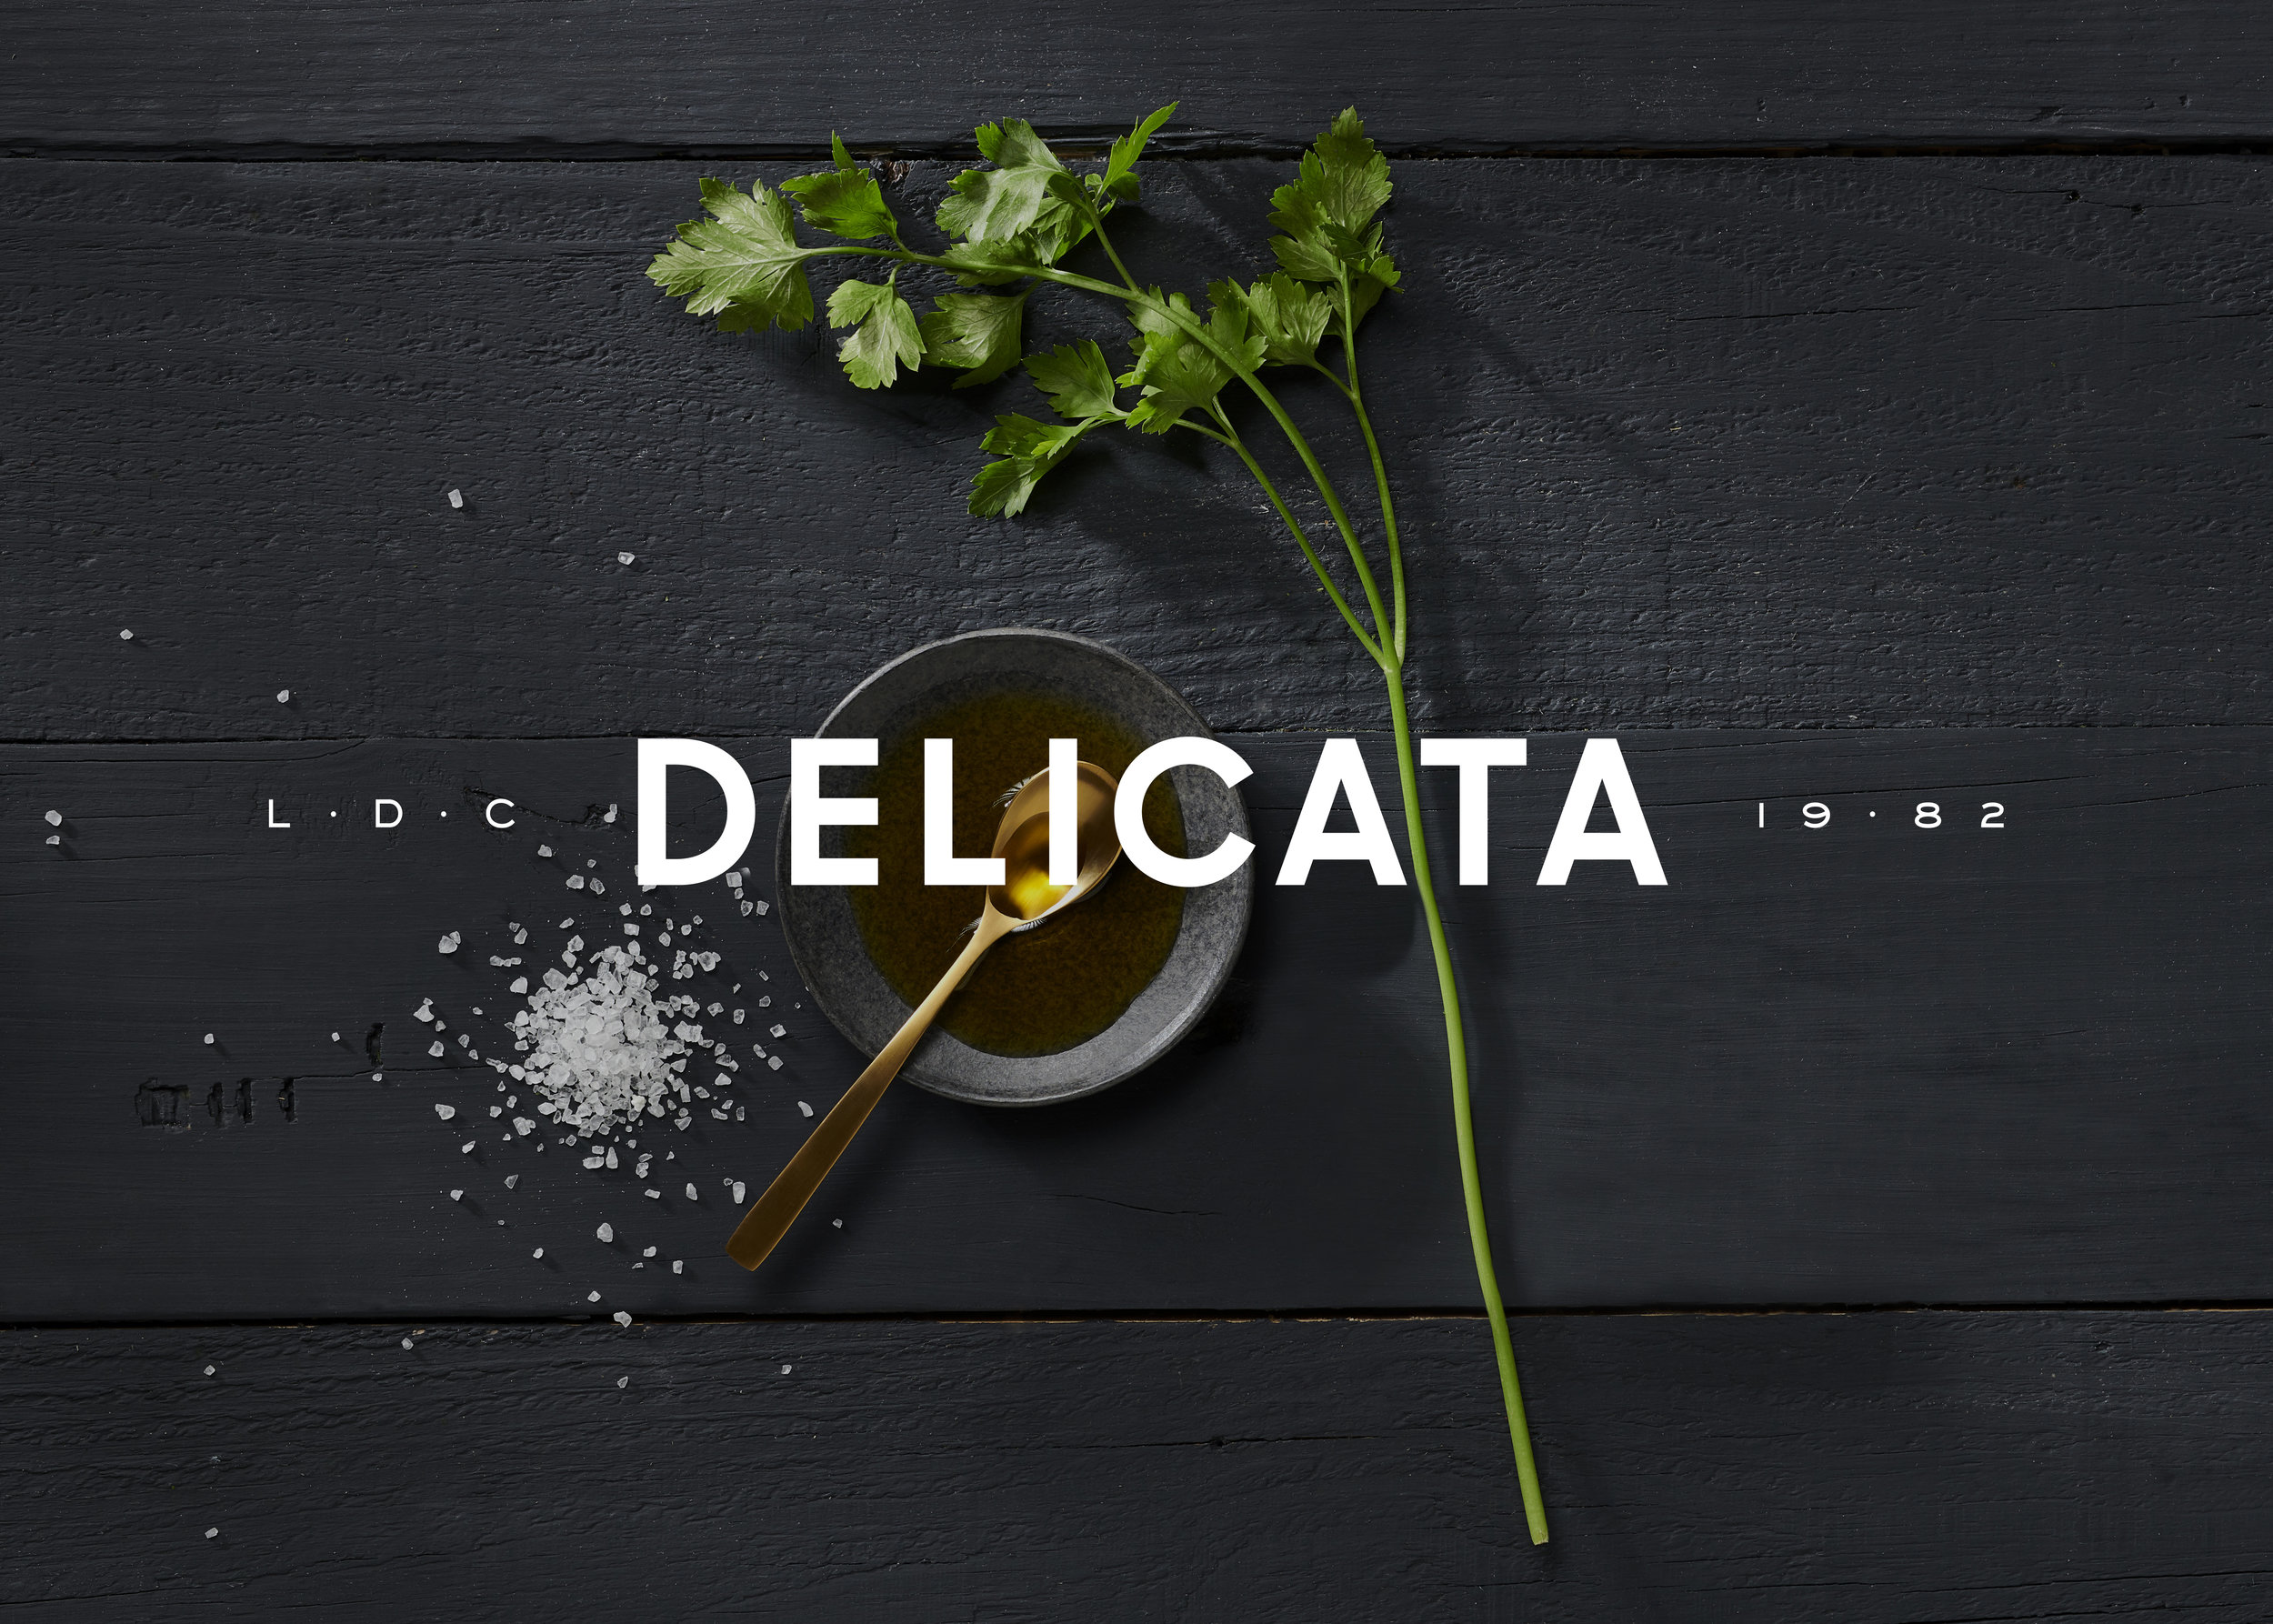 LAT_Delicata_OliveOil_Logo.jpg